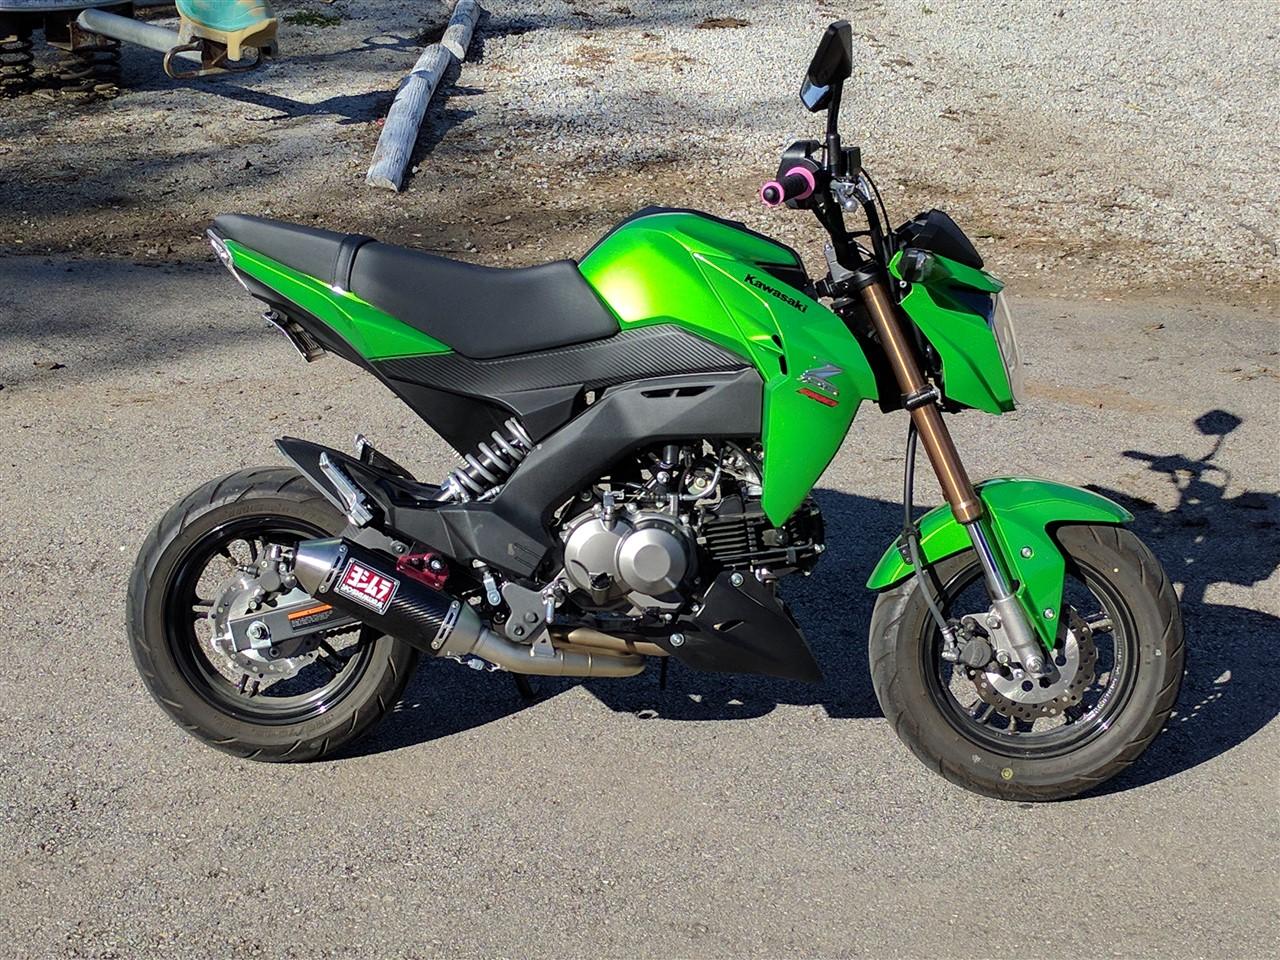 Kawasaki Z125 Forum - View Single Post - Lime Green Kawasaki